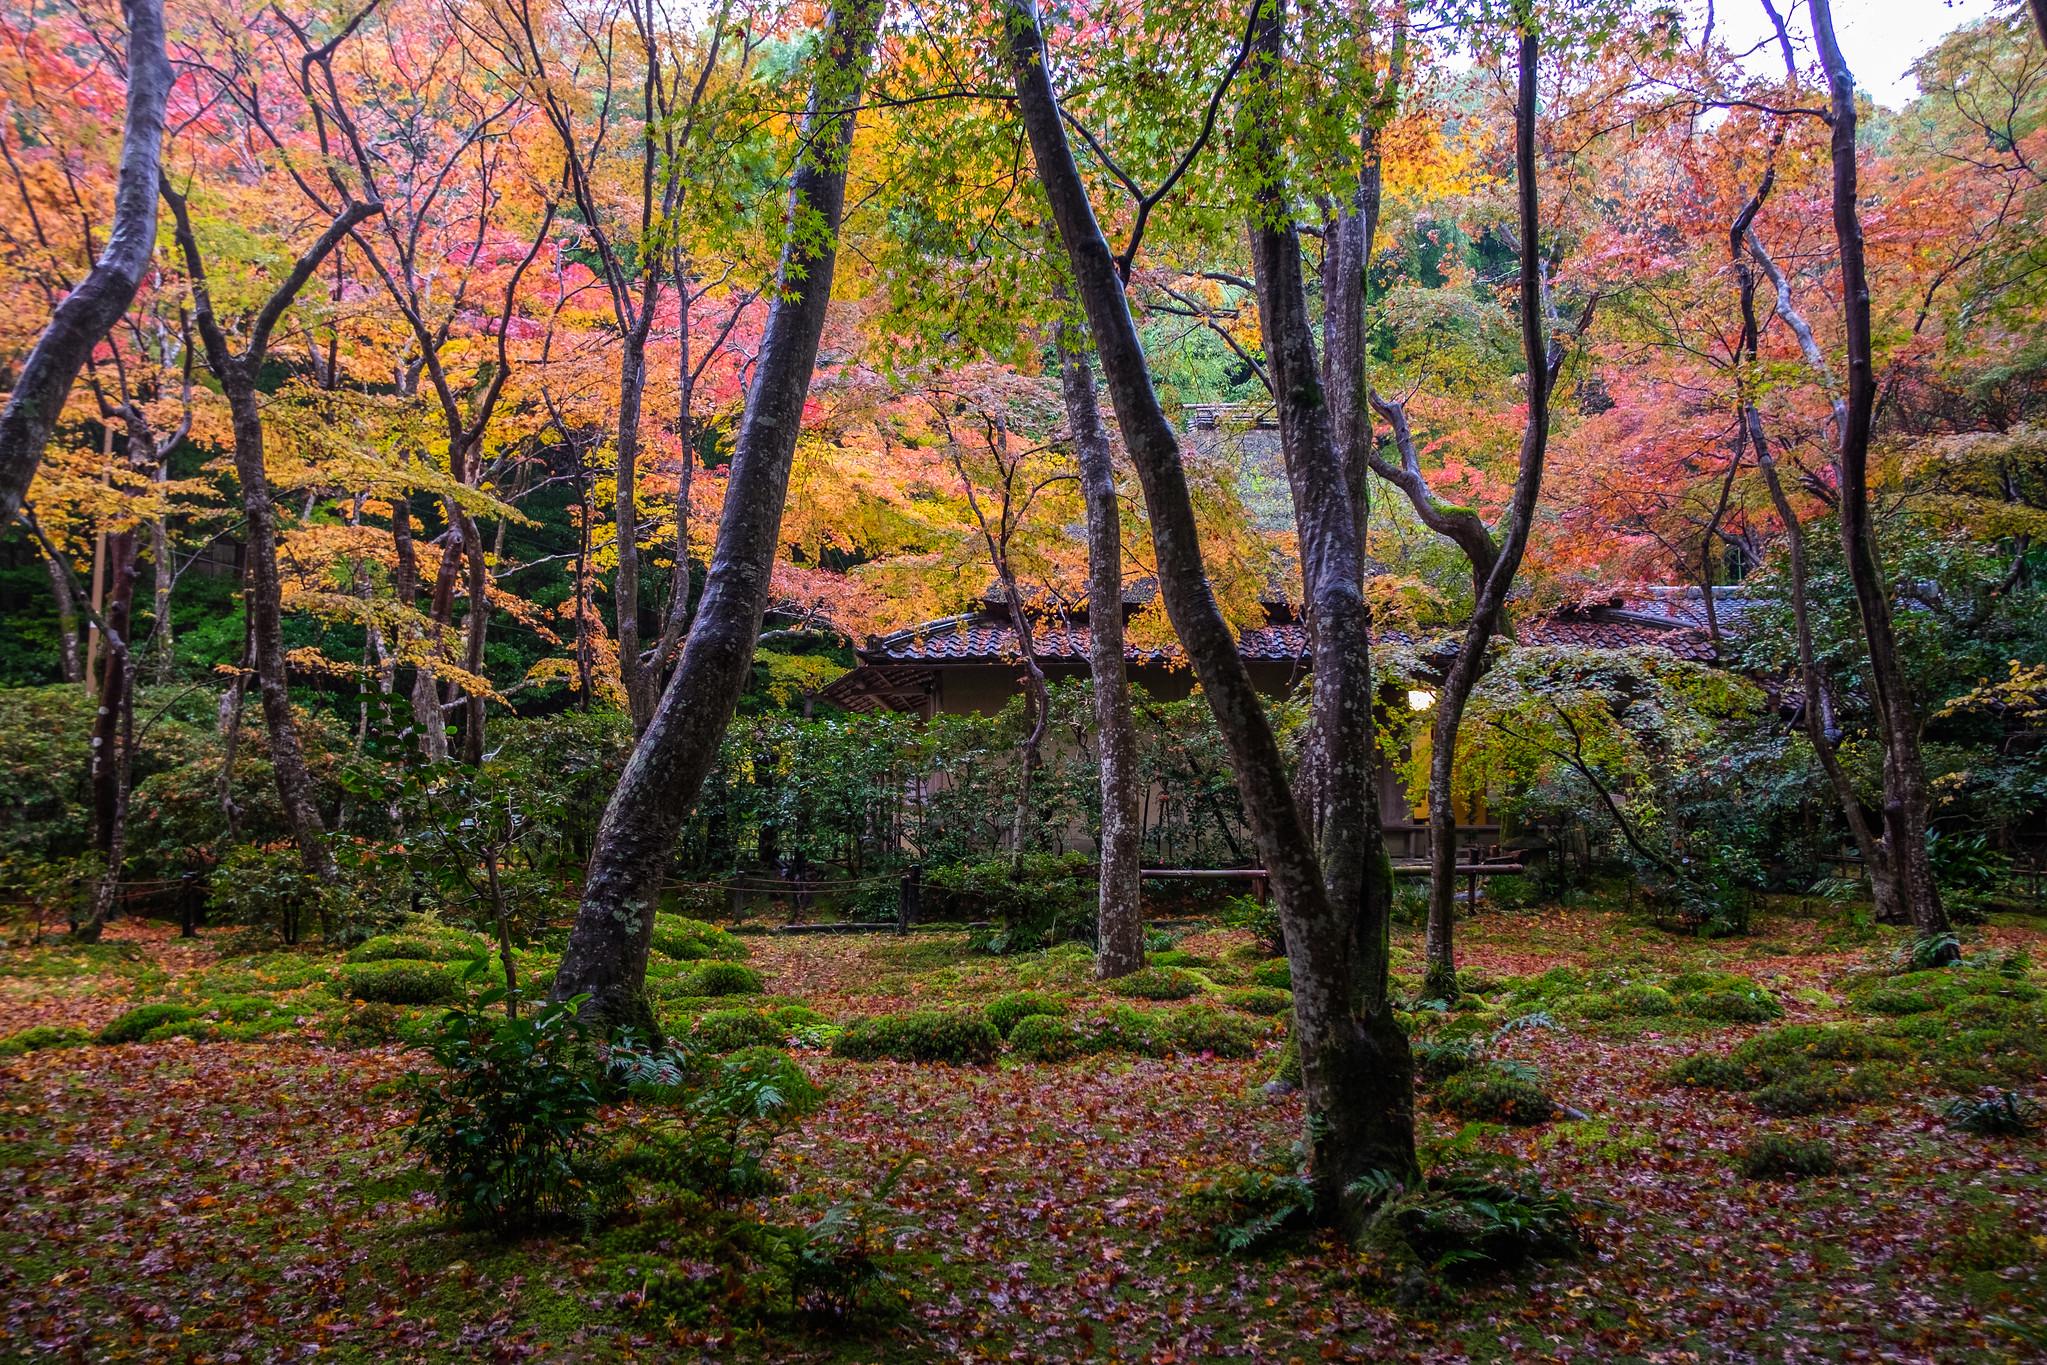 momiji '16 - autumn foliage #3 (Gio-ji temple, Kyoto)